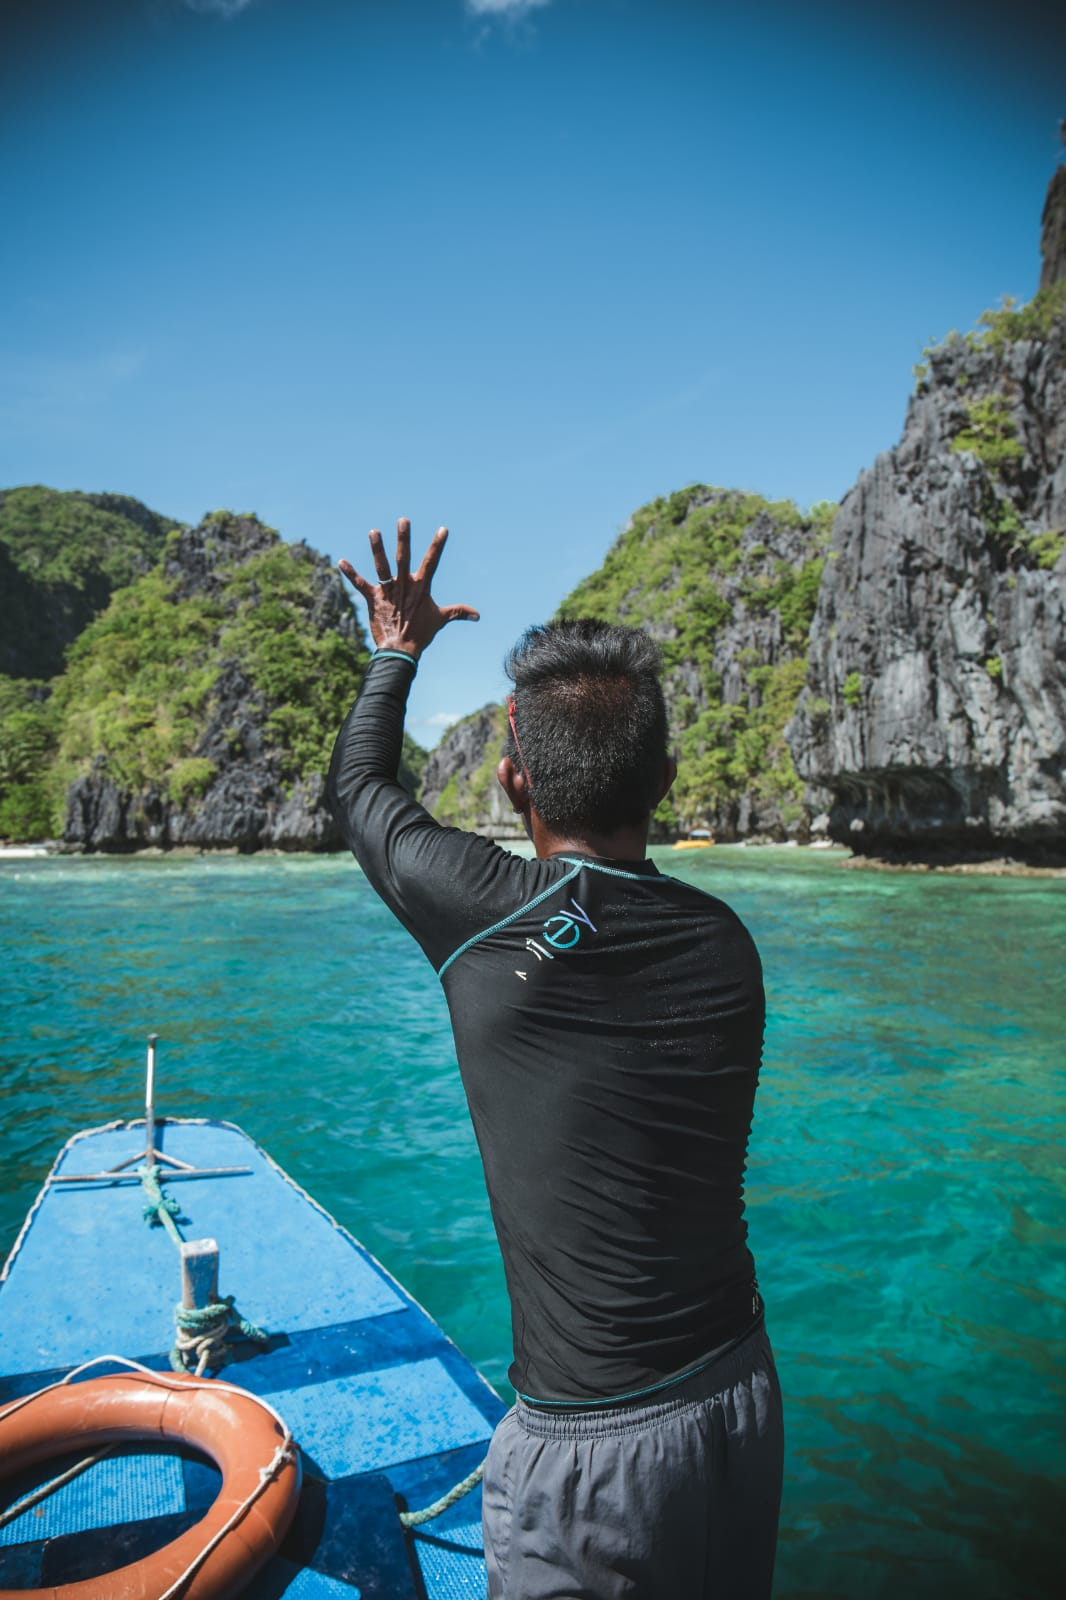 travel-blog-blogger-redhead-round-the-world-philippines-boat-el-nido-island.jpg